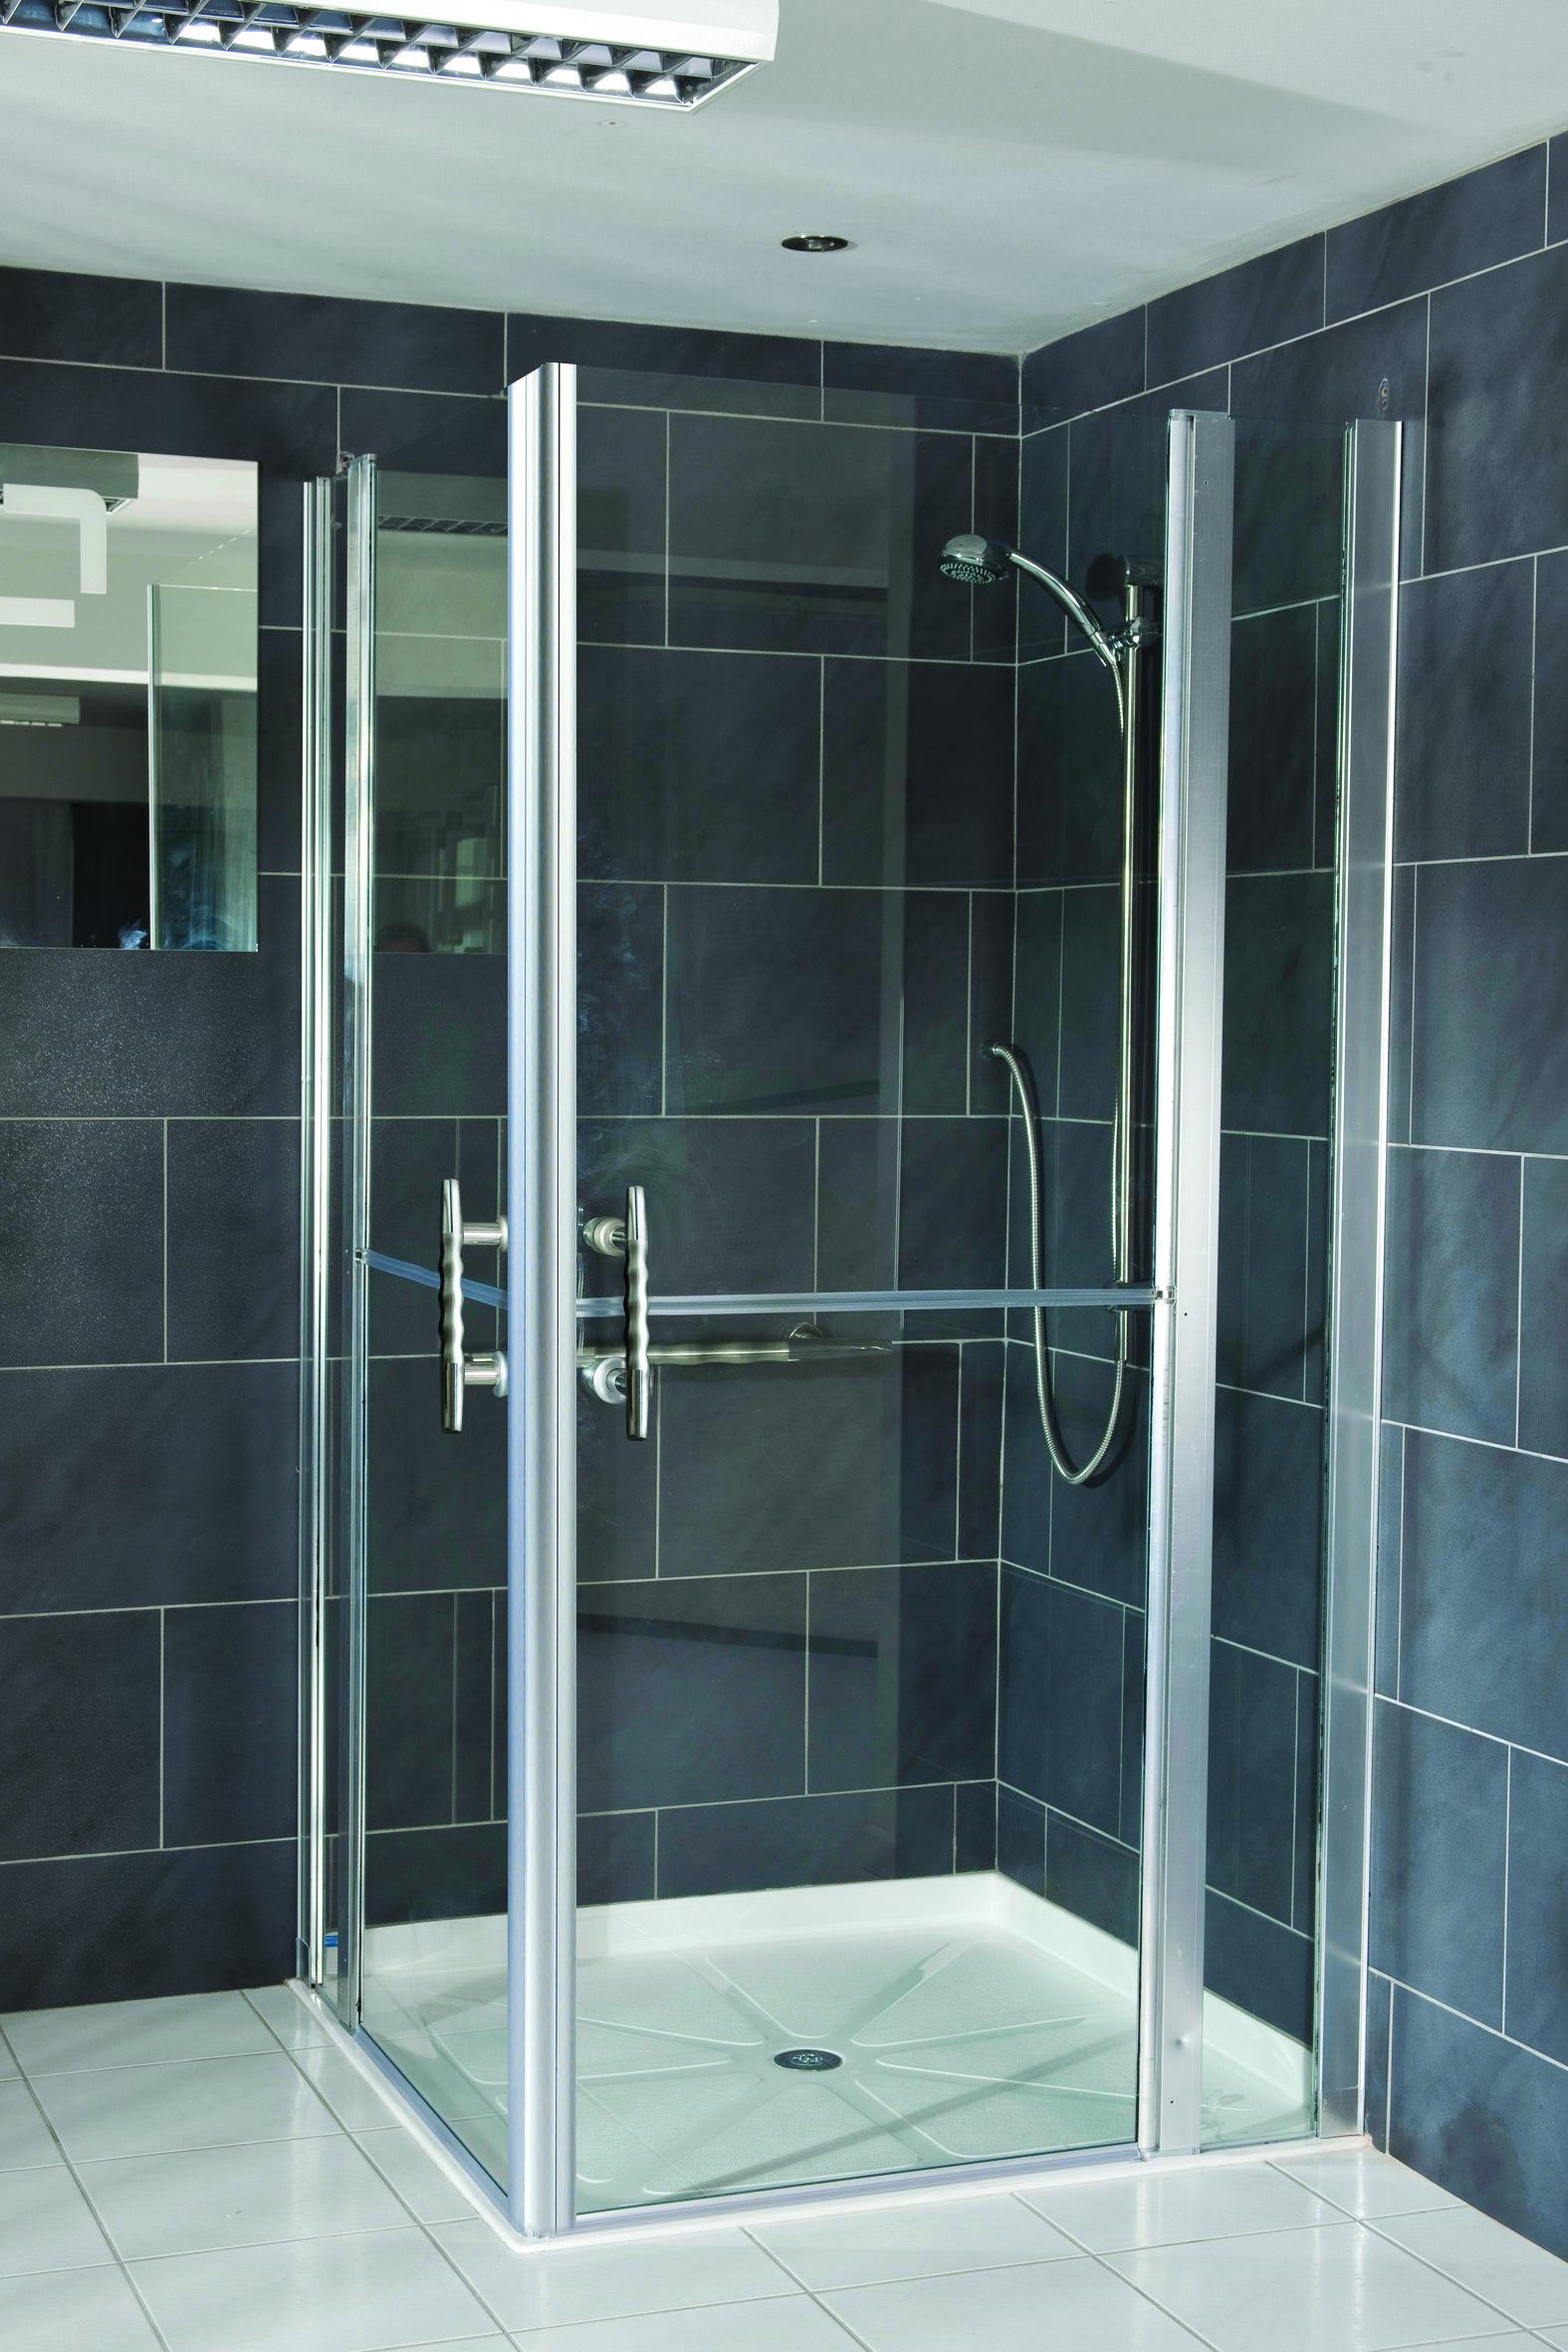 Elegance Doors O'Connor Carroll Bathrooms & Tiles Dublin